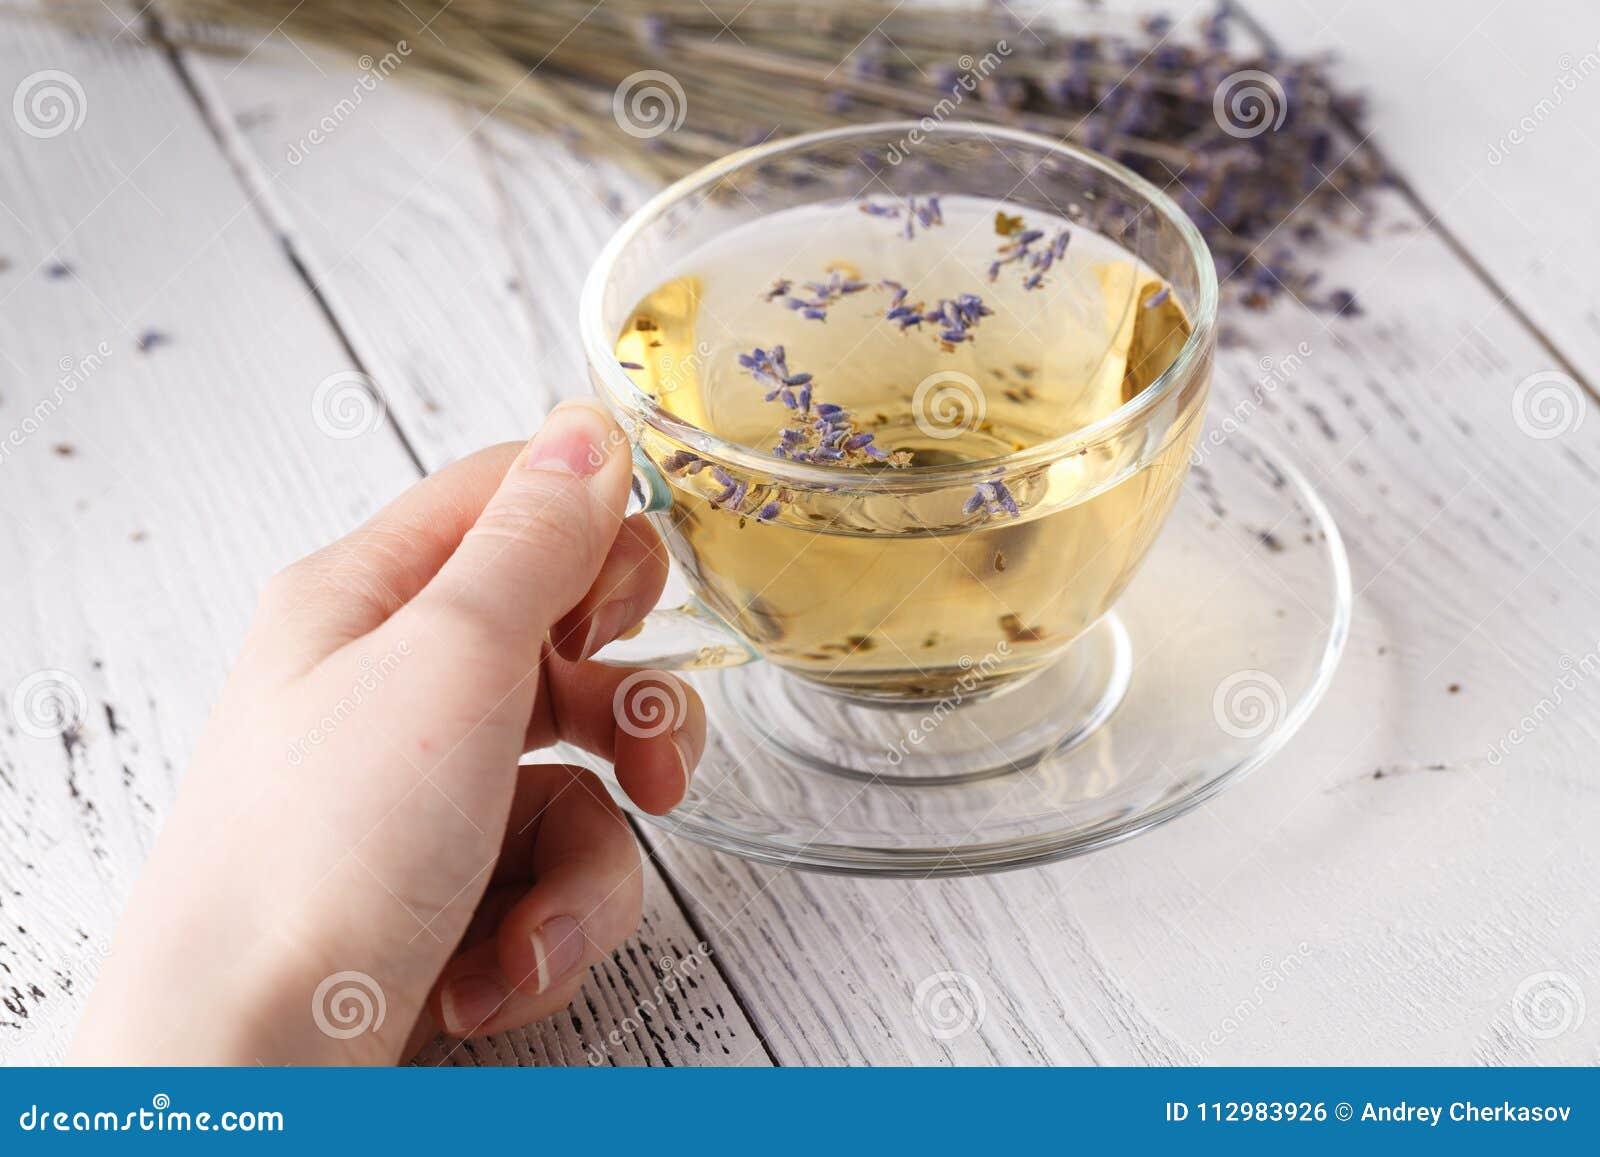 Female hold hot aromatic herbal tea